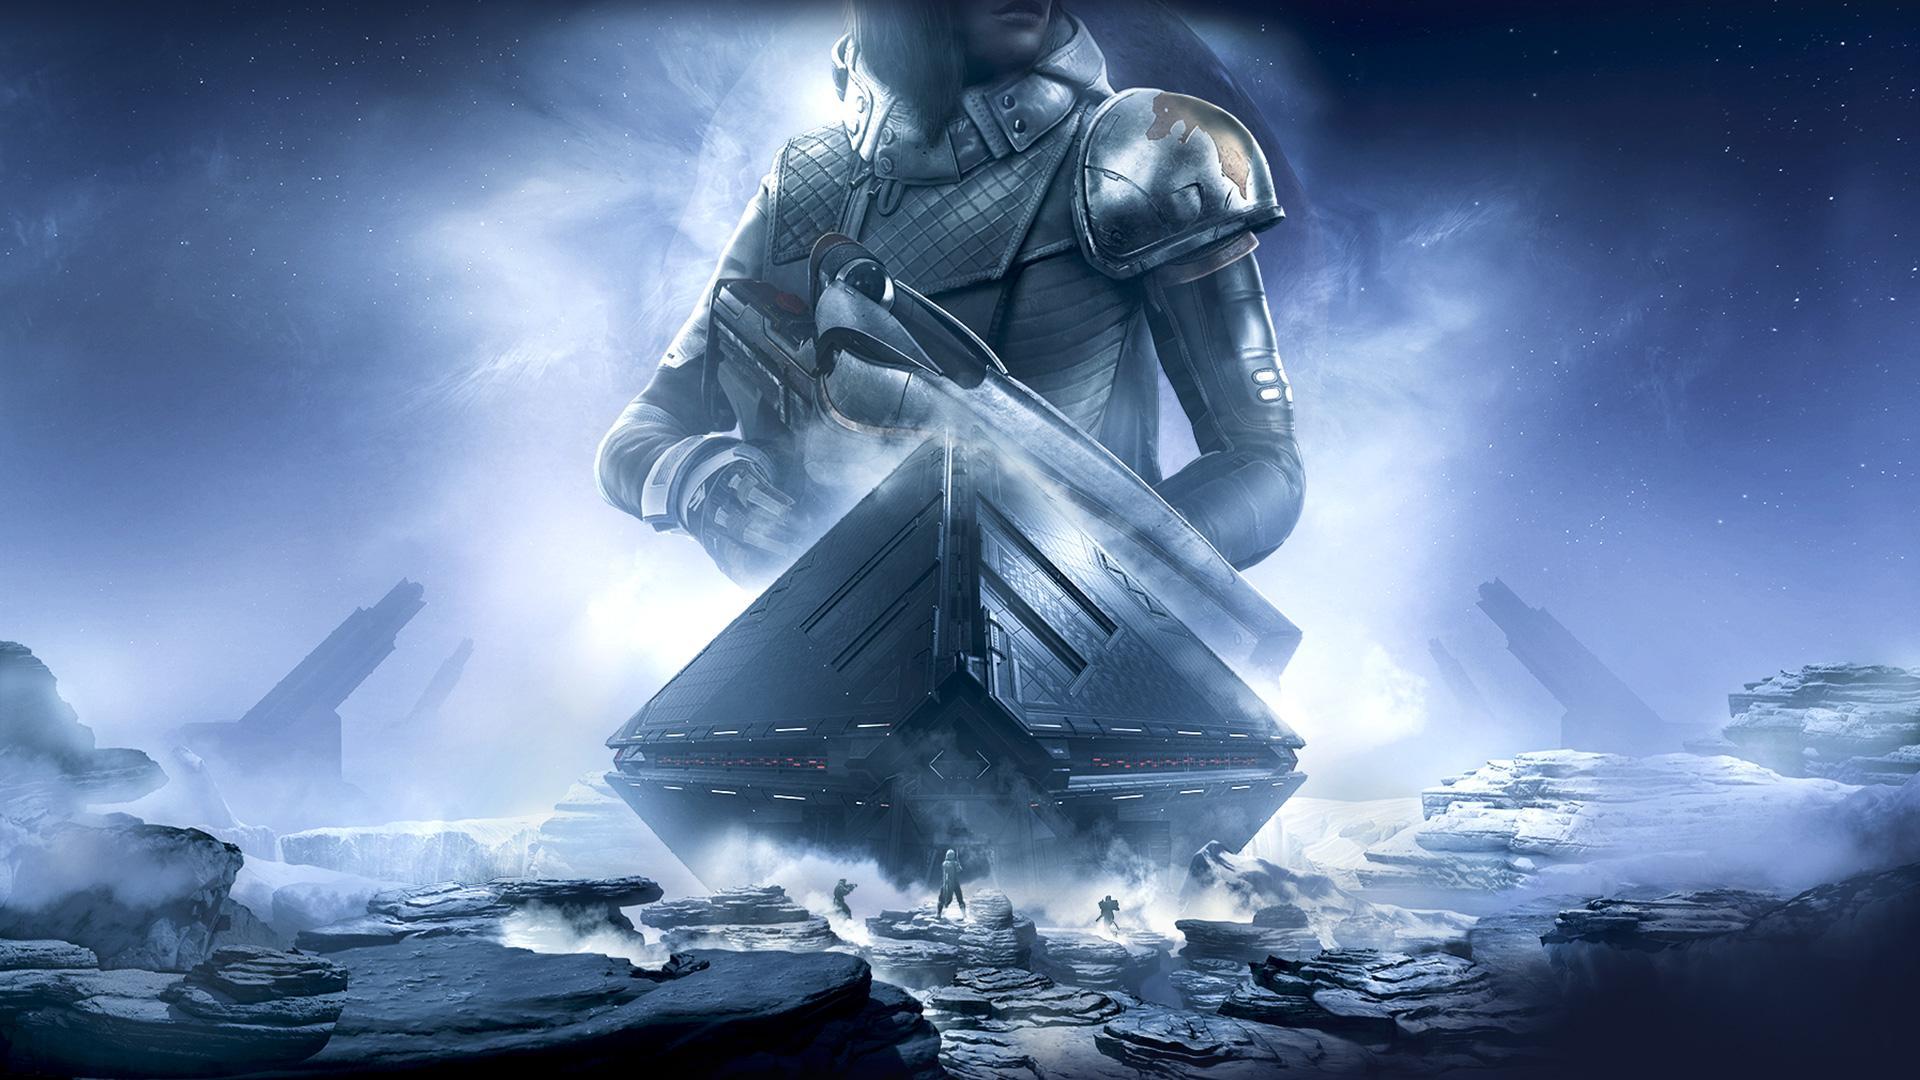 Destiny 2 Background Hd Destiny 2 Warmind Dlc 19x1080 Wallpaper Teahub Io